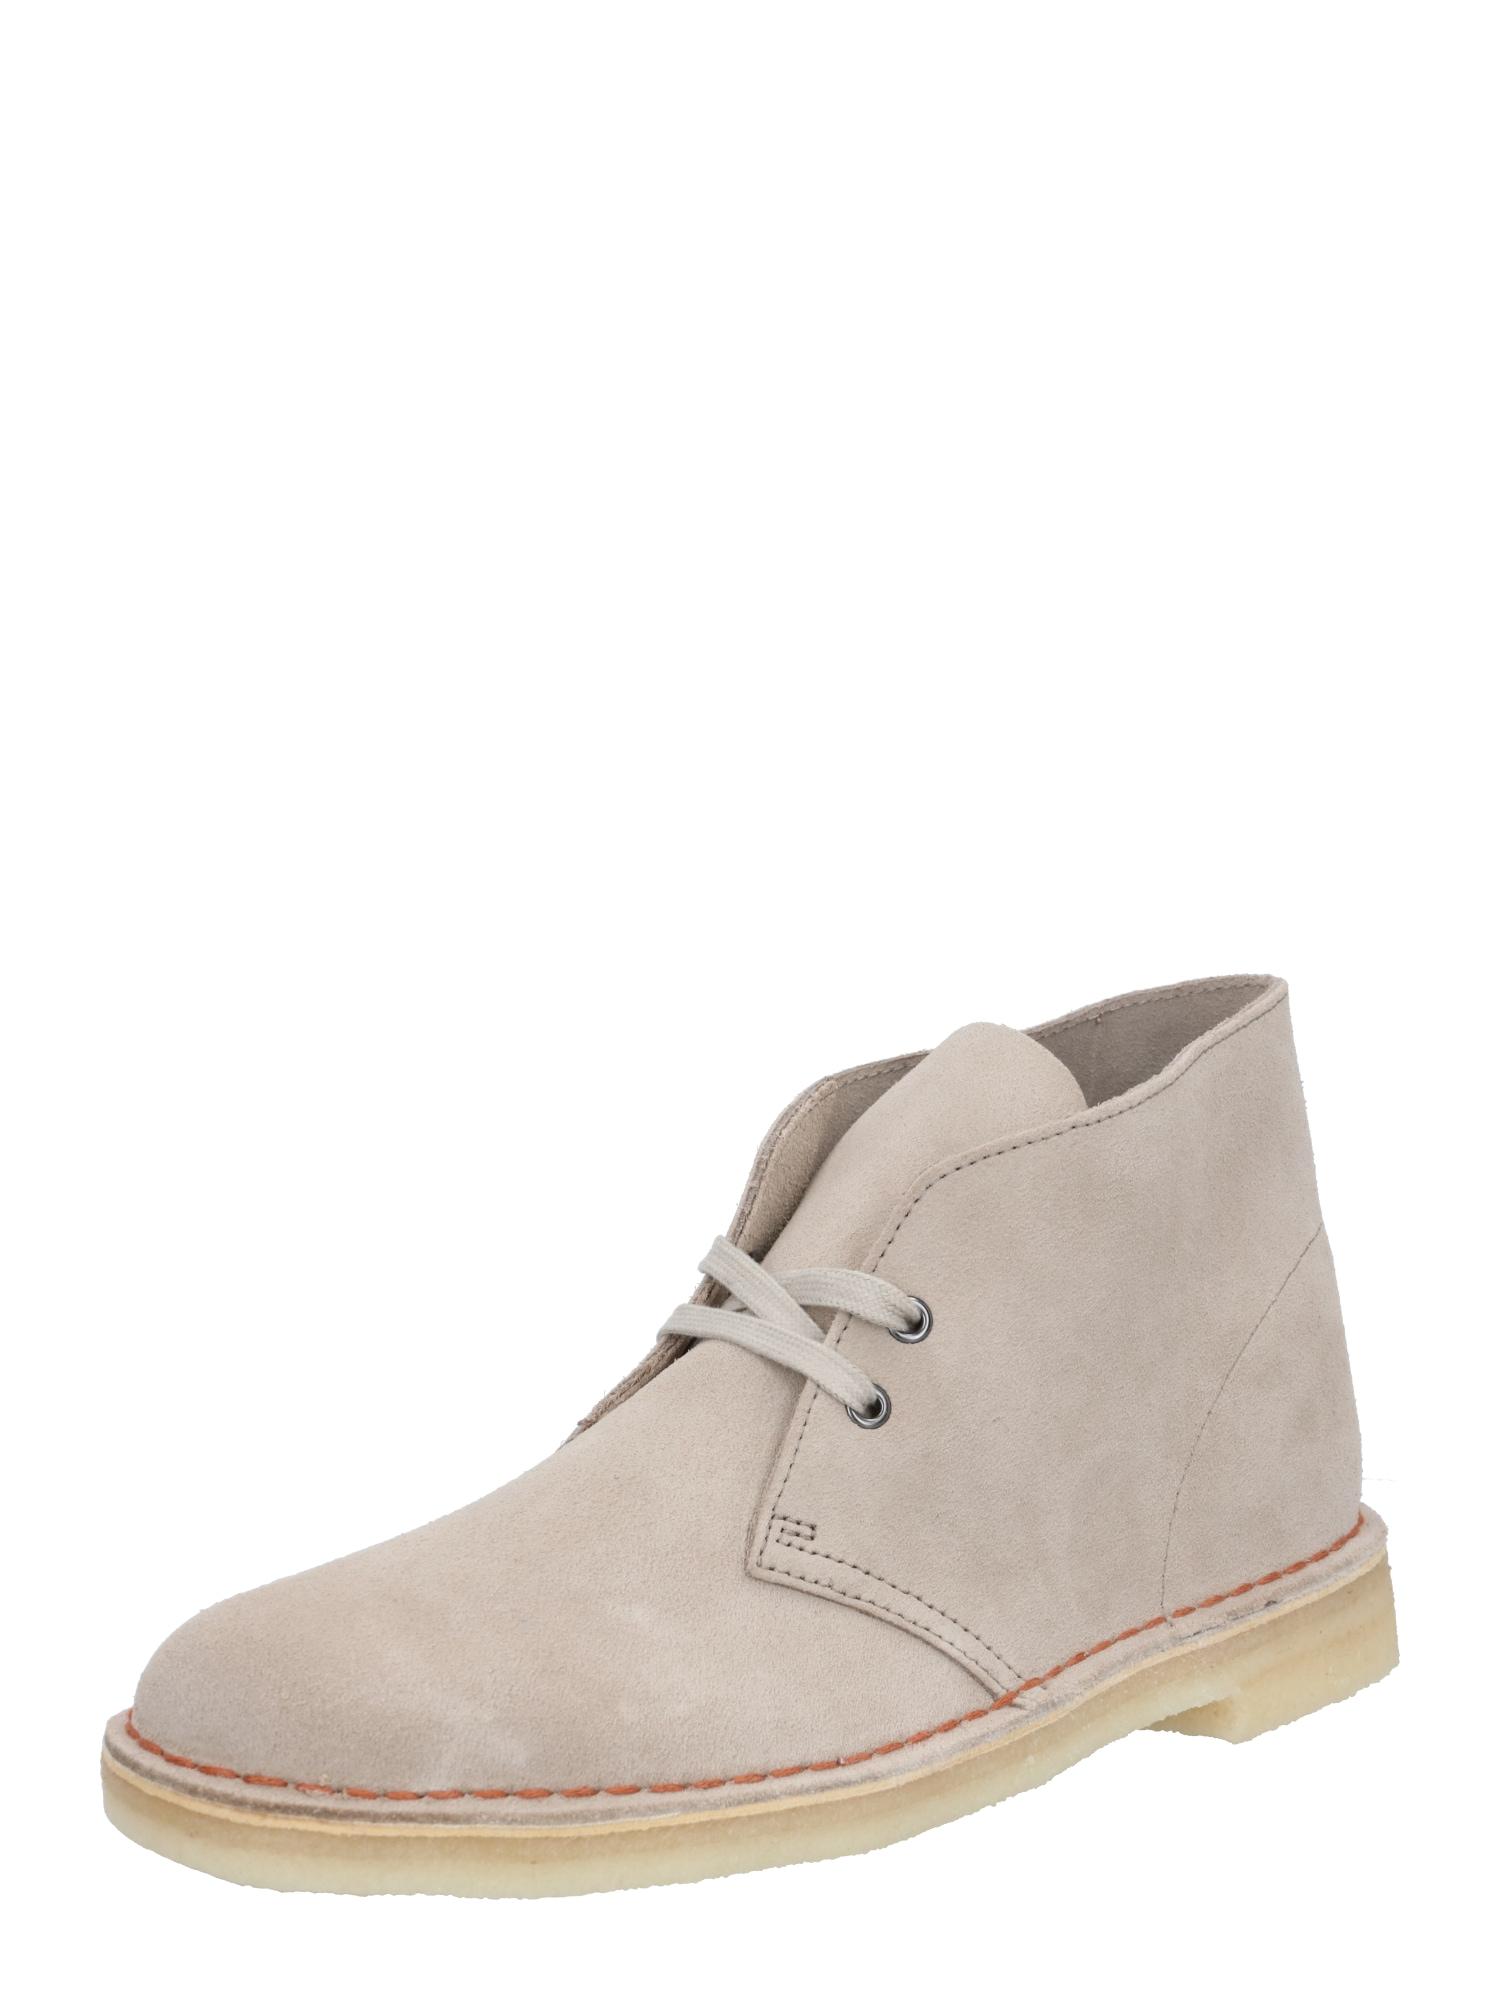 "Clarks Originals ""Chukka"" batai smėlio"